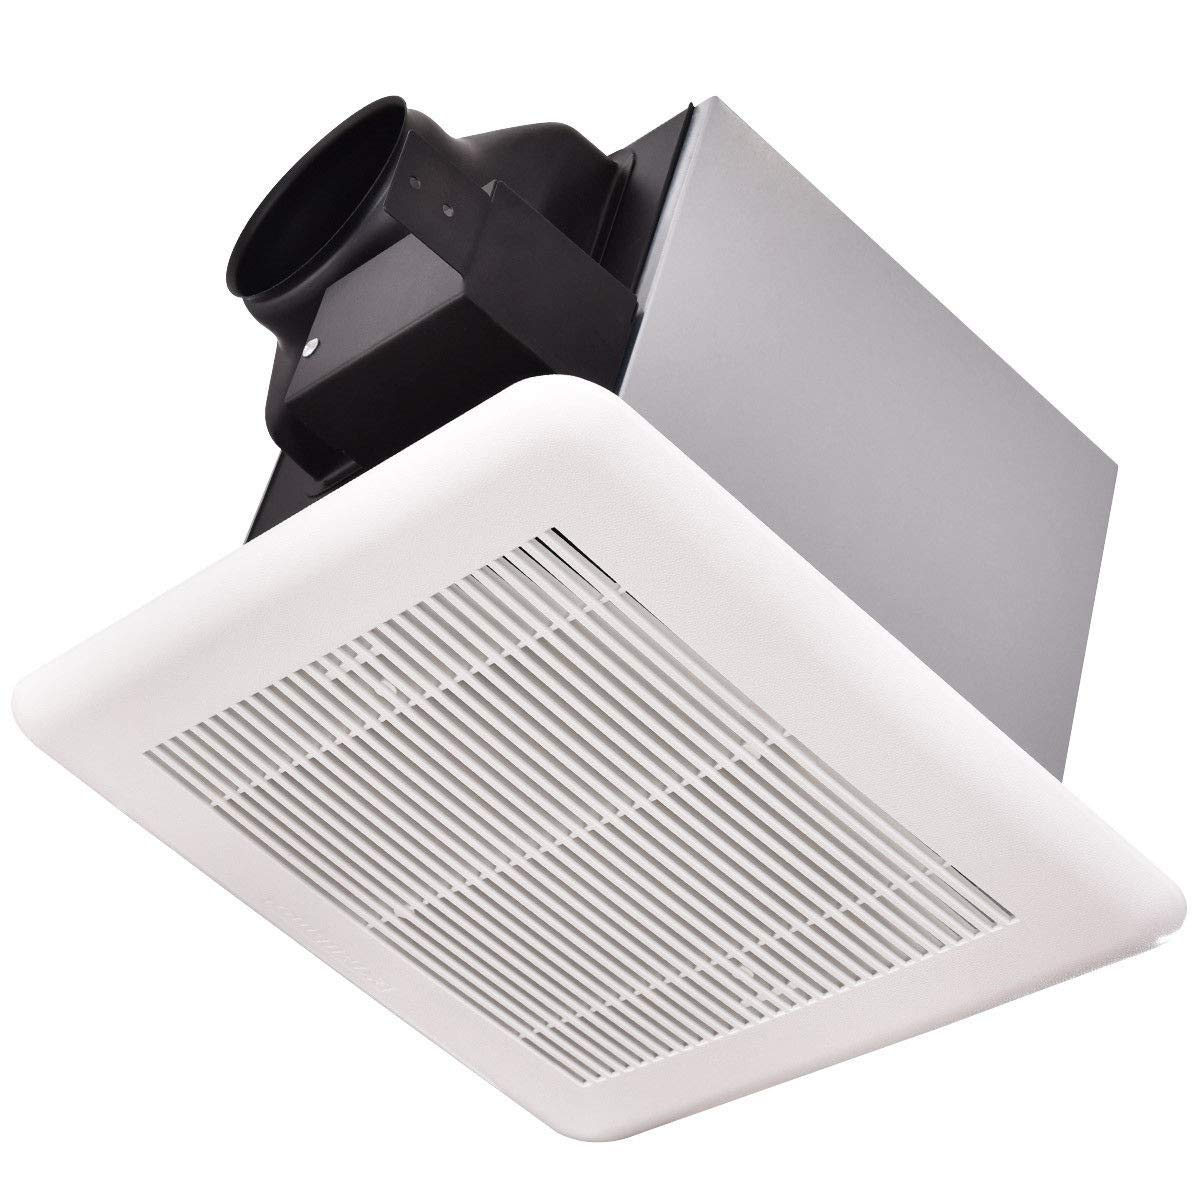 Imtinanz Modern Style Bathroom 50 CFM Ceiling Wall Mounted Exhaust Fan